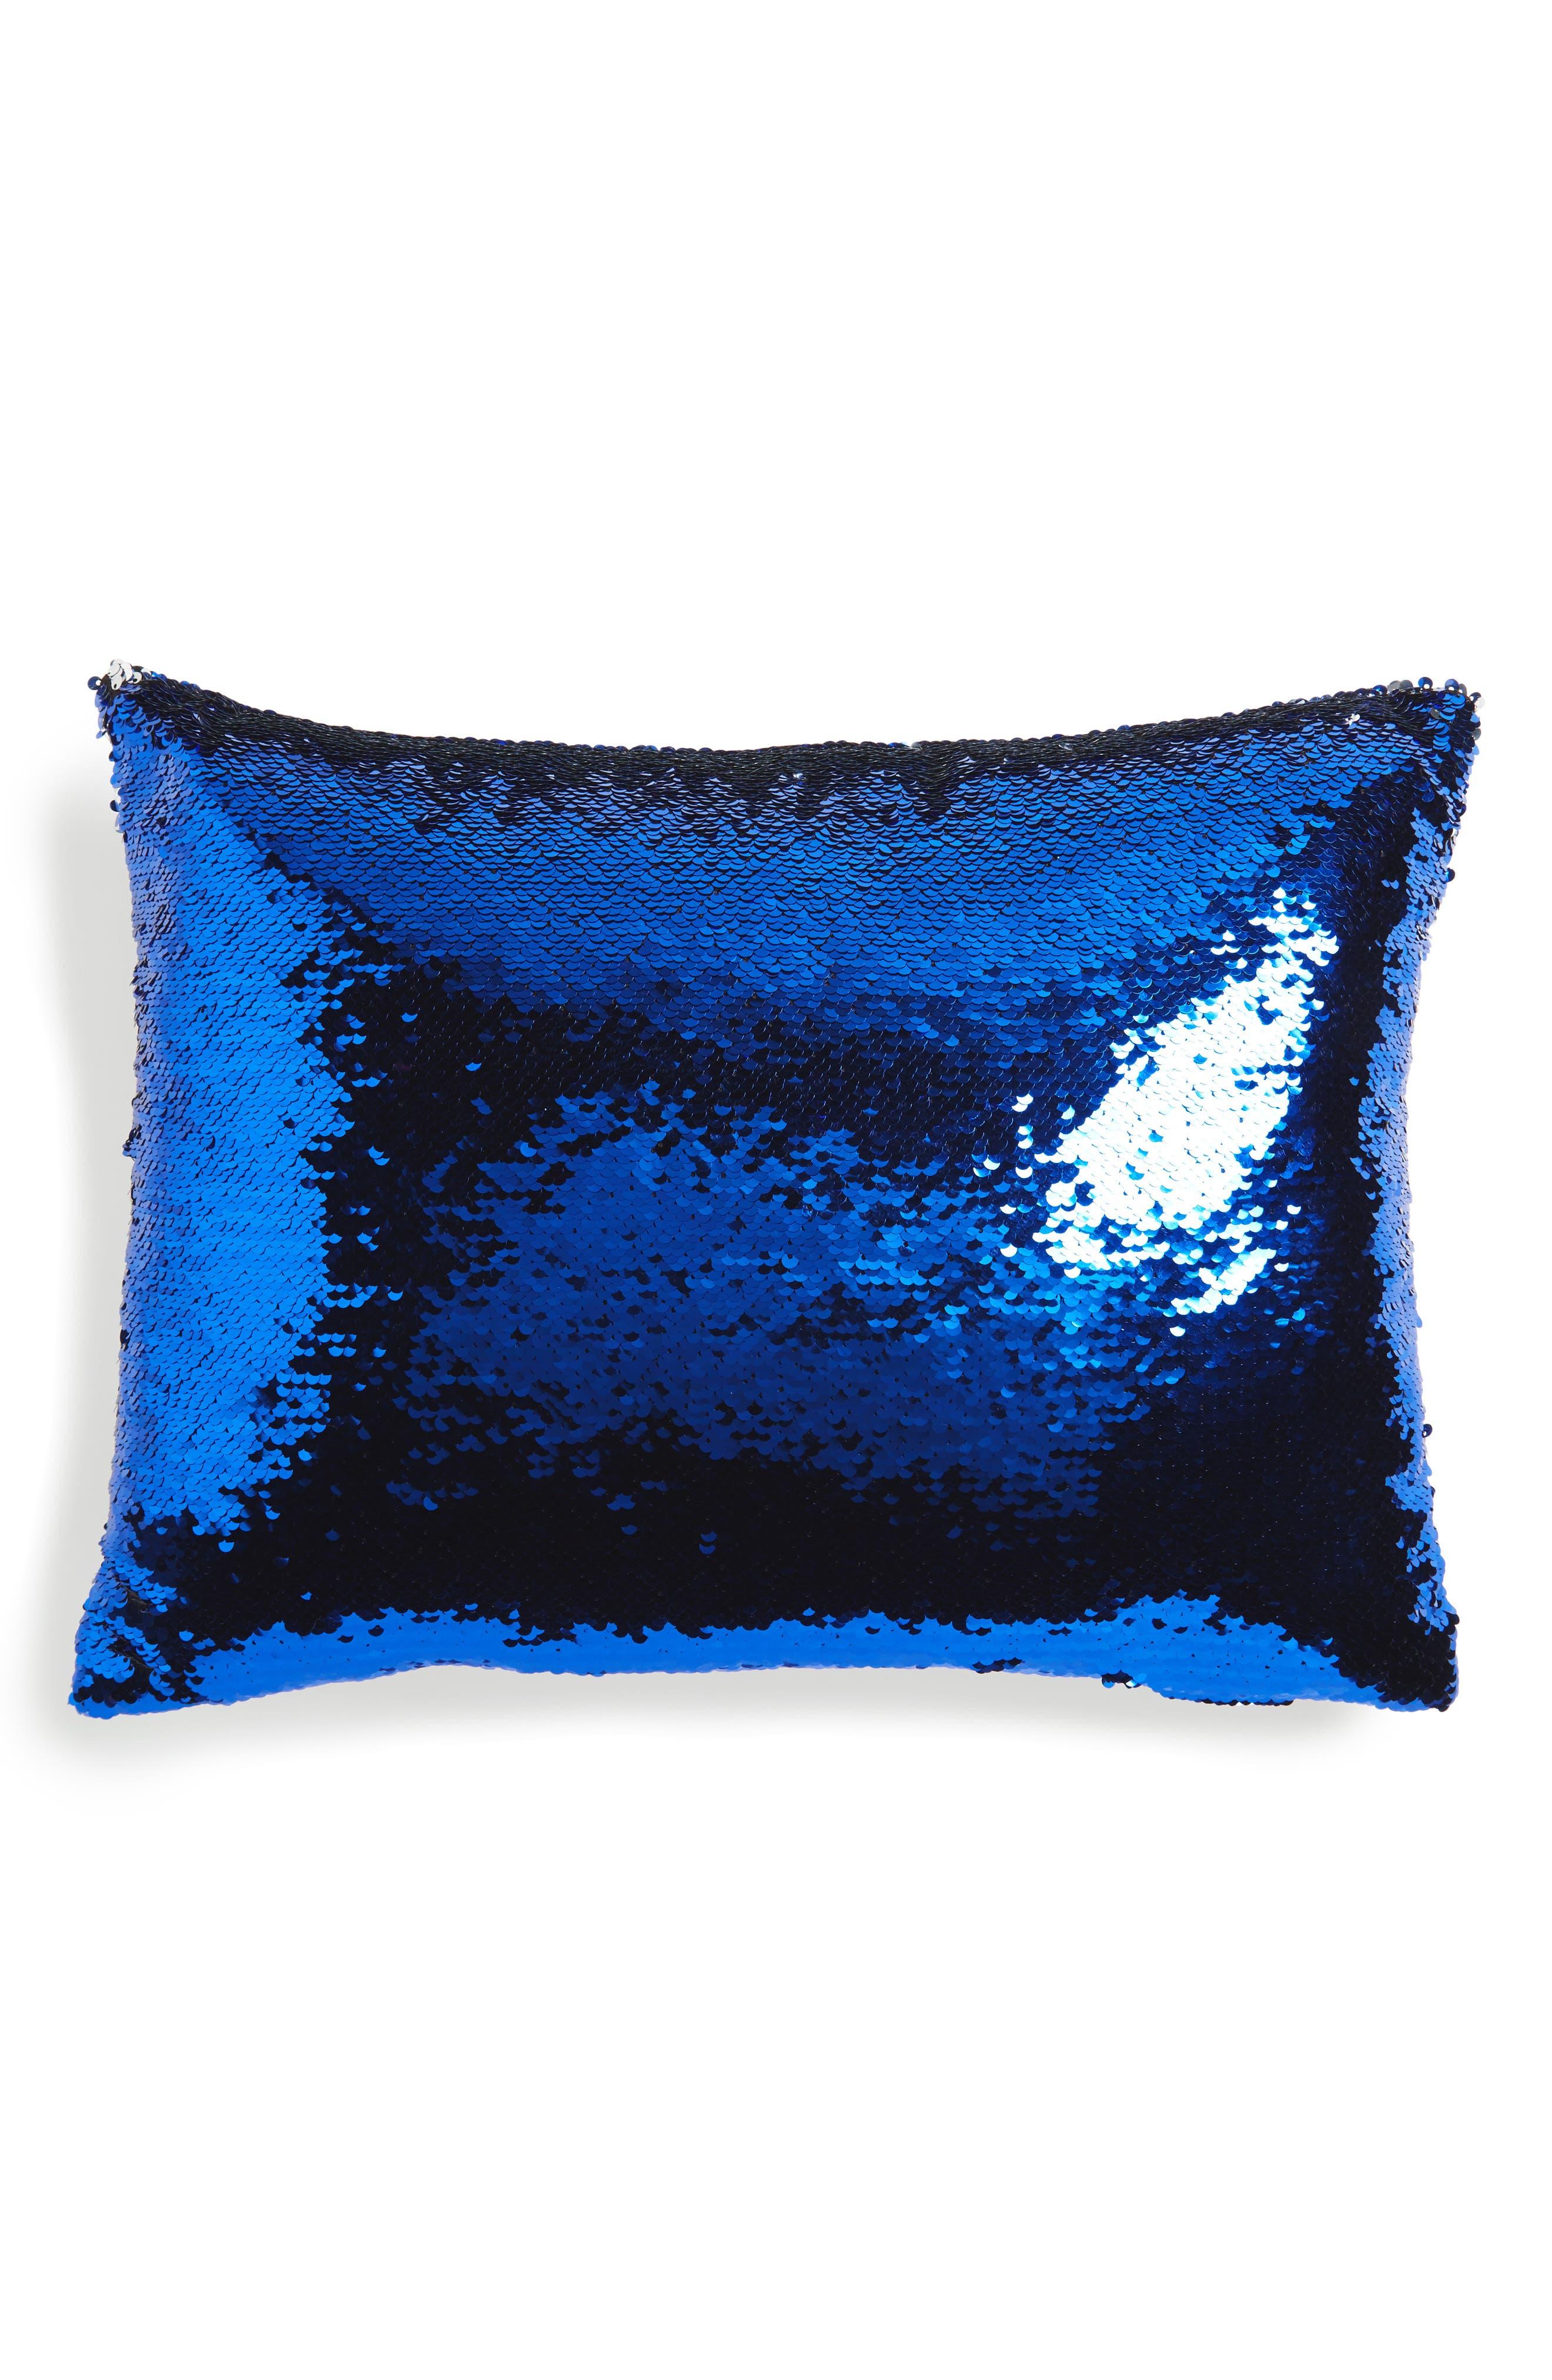 Sequin Pillow,                             Main thumbnail 1, color,                             400